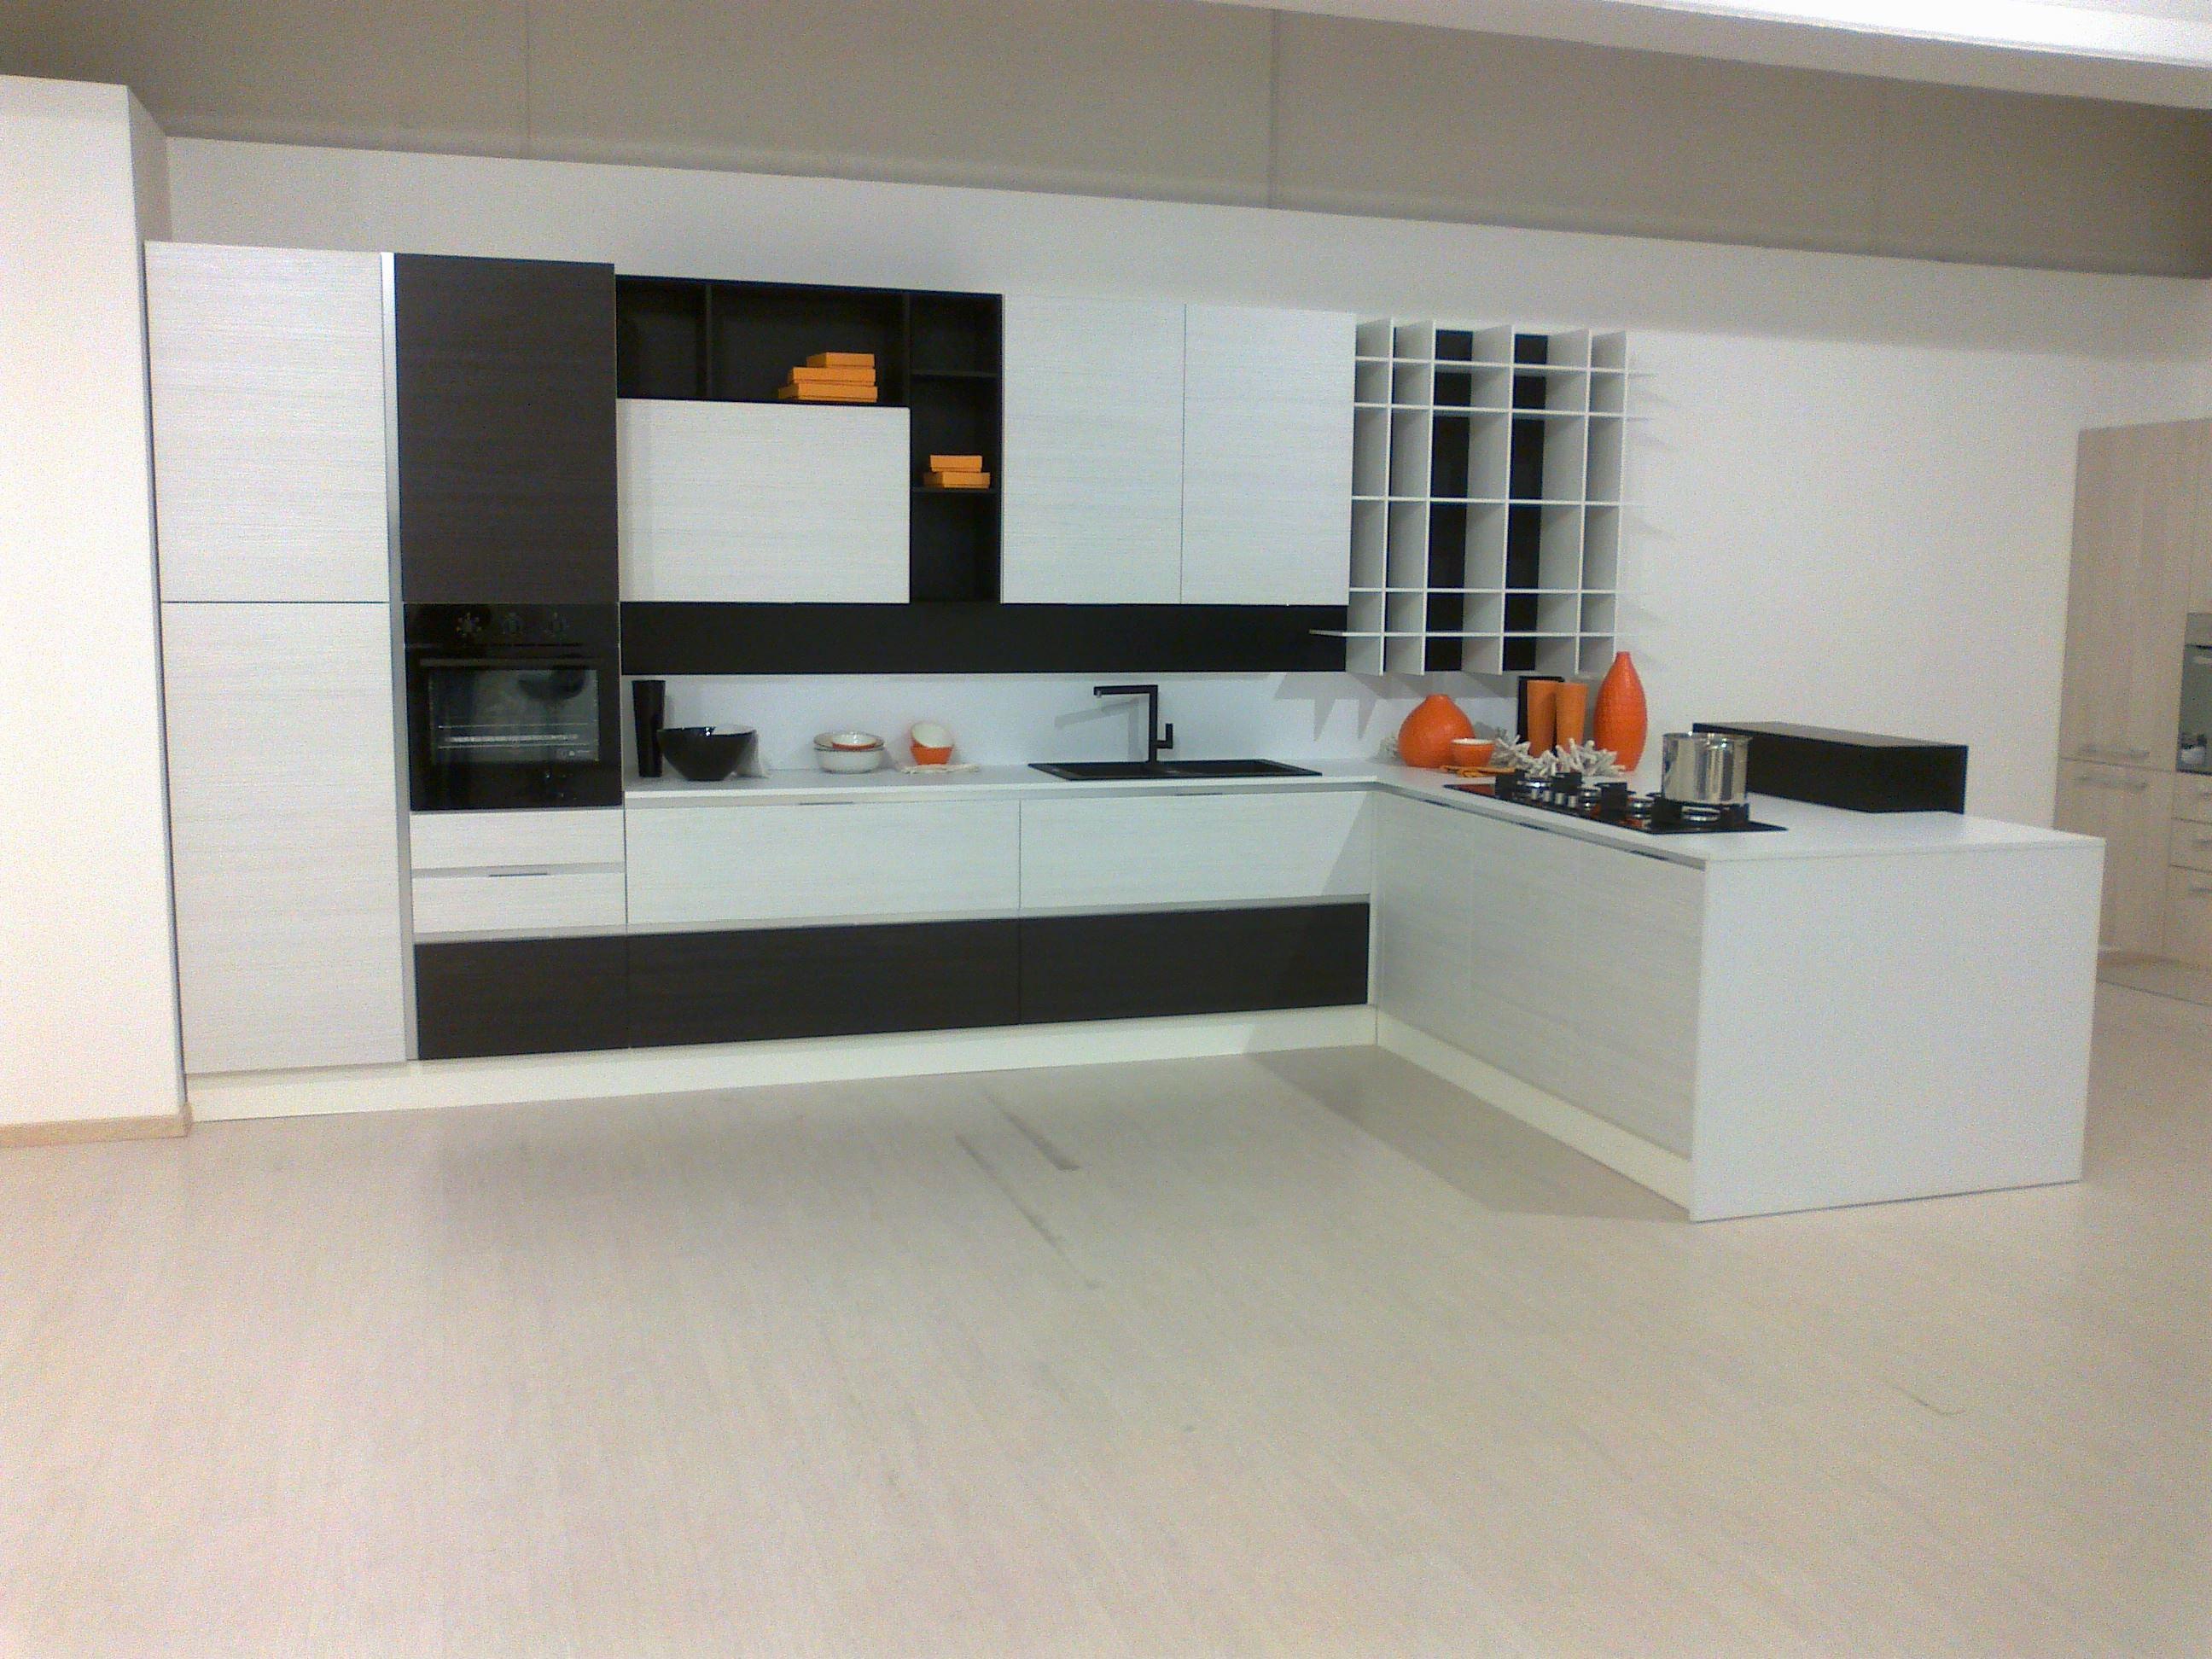 Beautiful Küchen Mit Bar Photos - Milbank.us - milbank.us